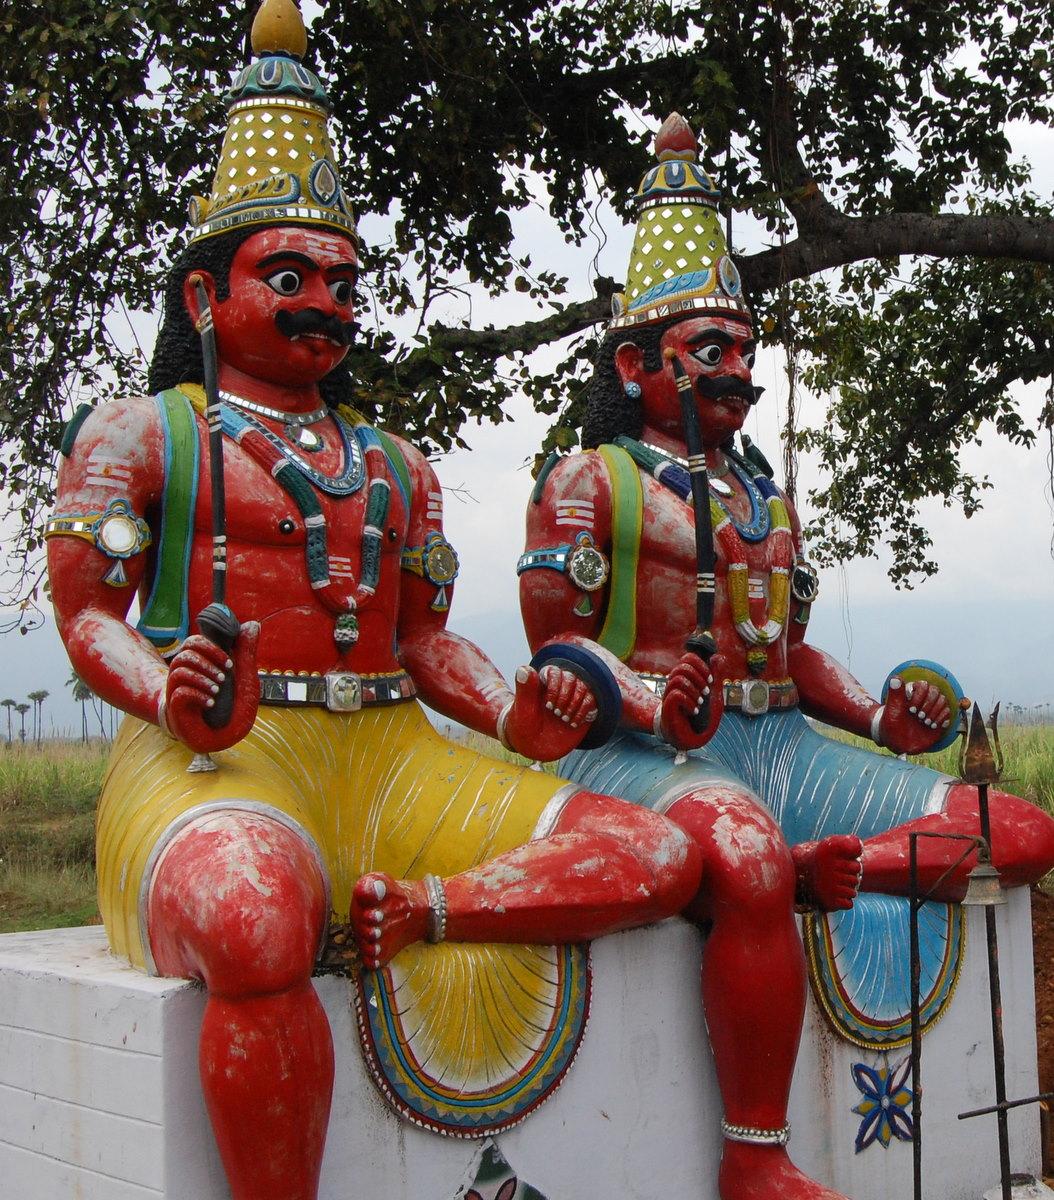 ayyanar temple க்கான பட முடிவு